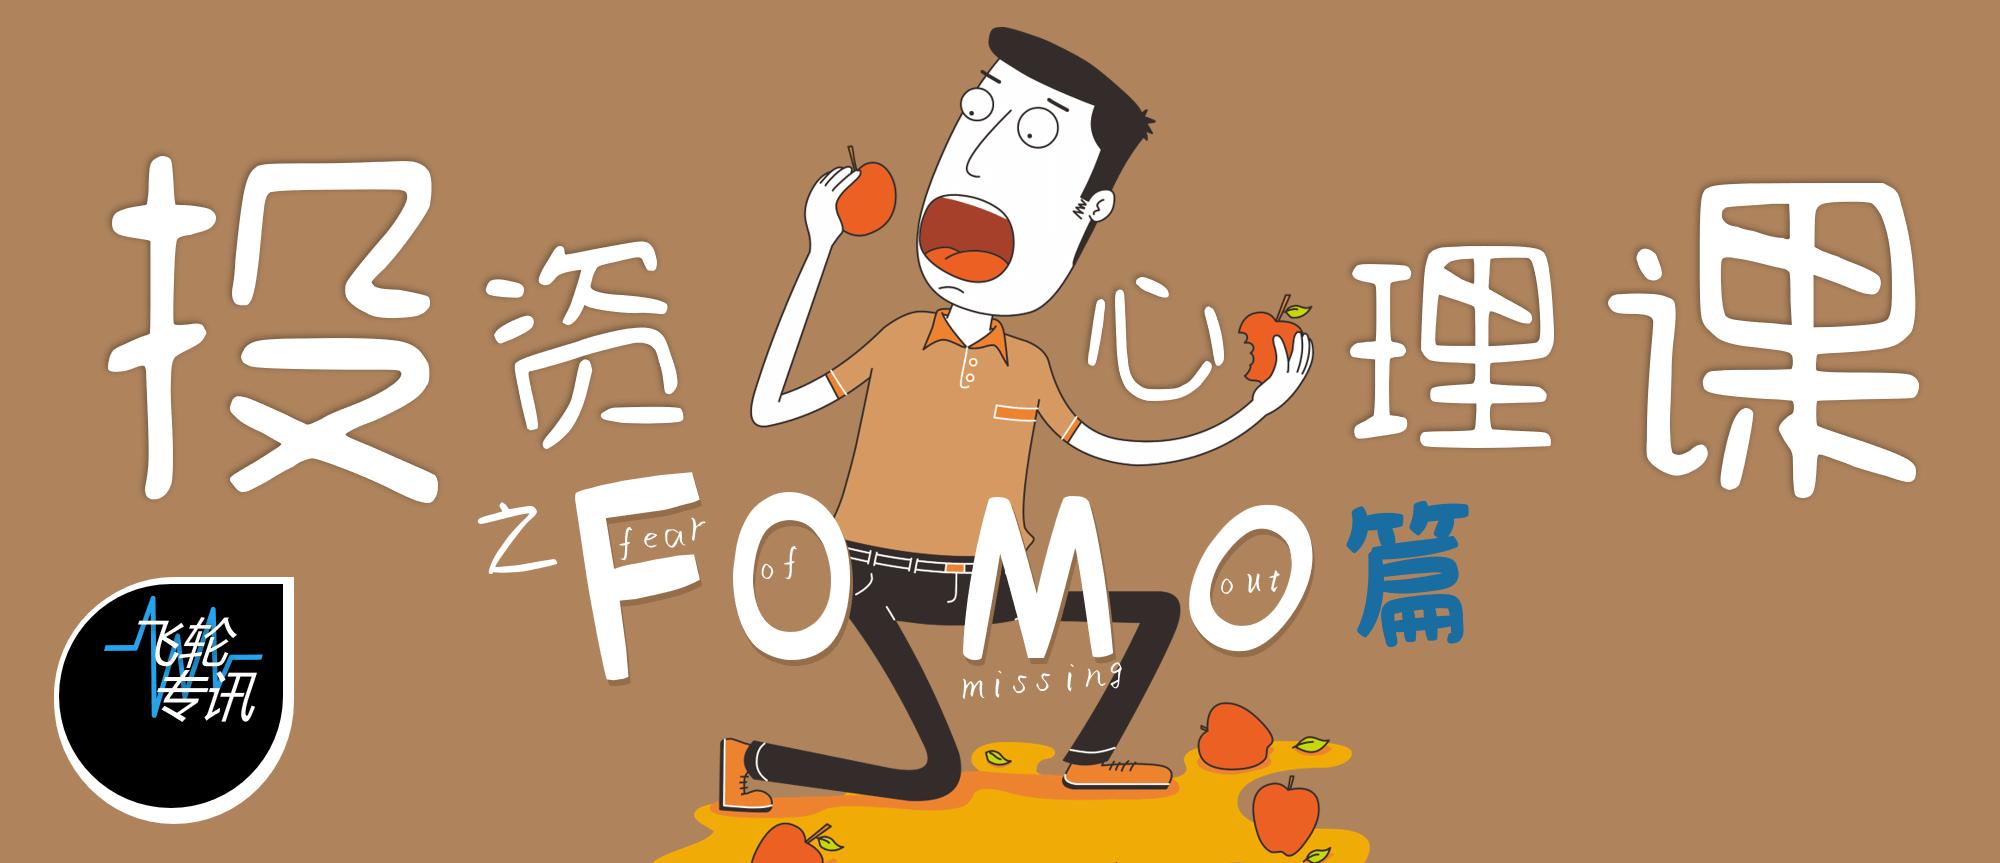 投资心理课之FOMO篇